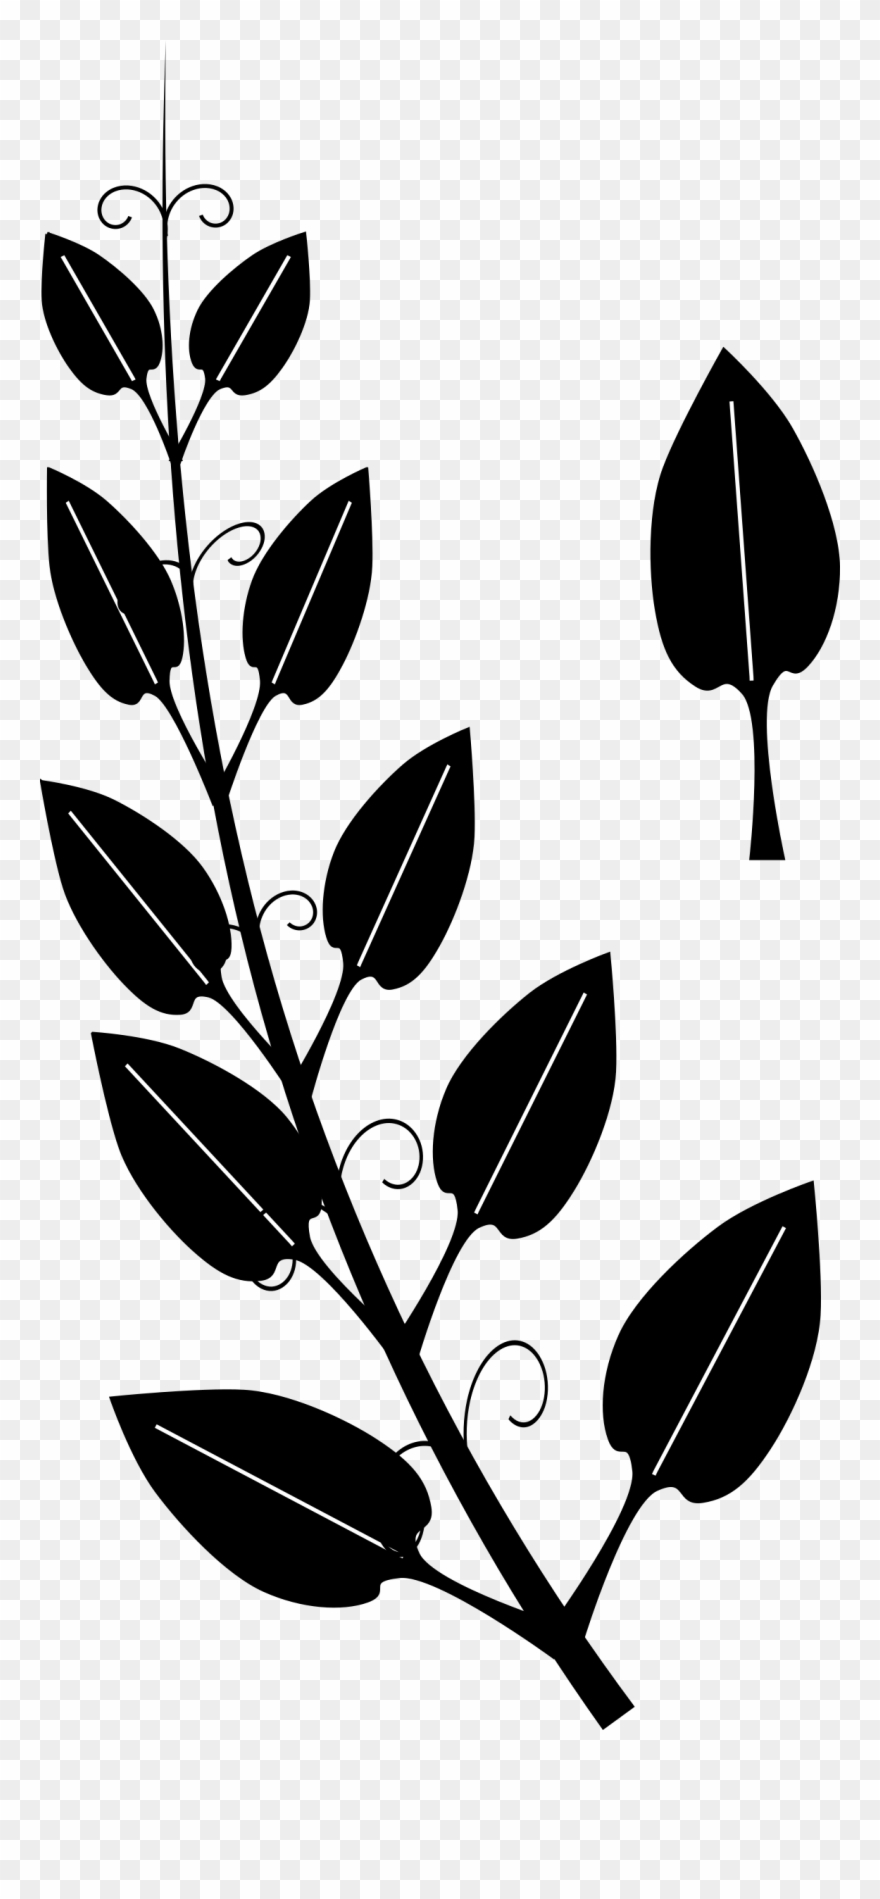 African jungle vine clipart jpg transparent stock Collection Of Leaf Vine High Quality - Black And White Silhouette ... jpg transparent stock